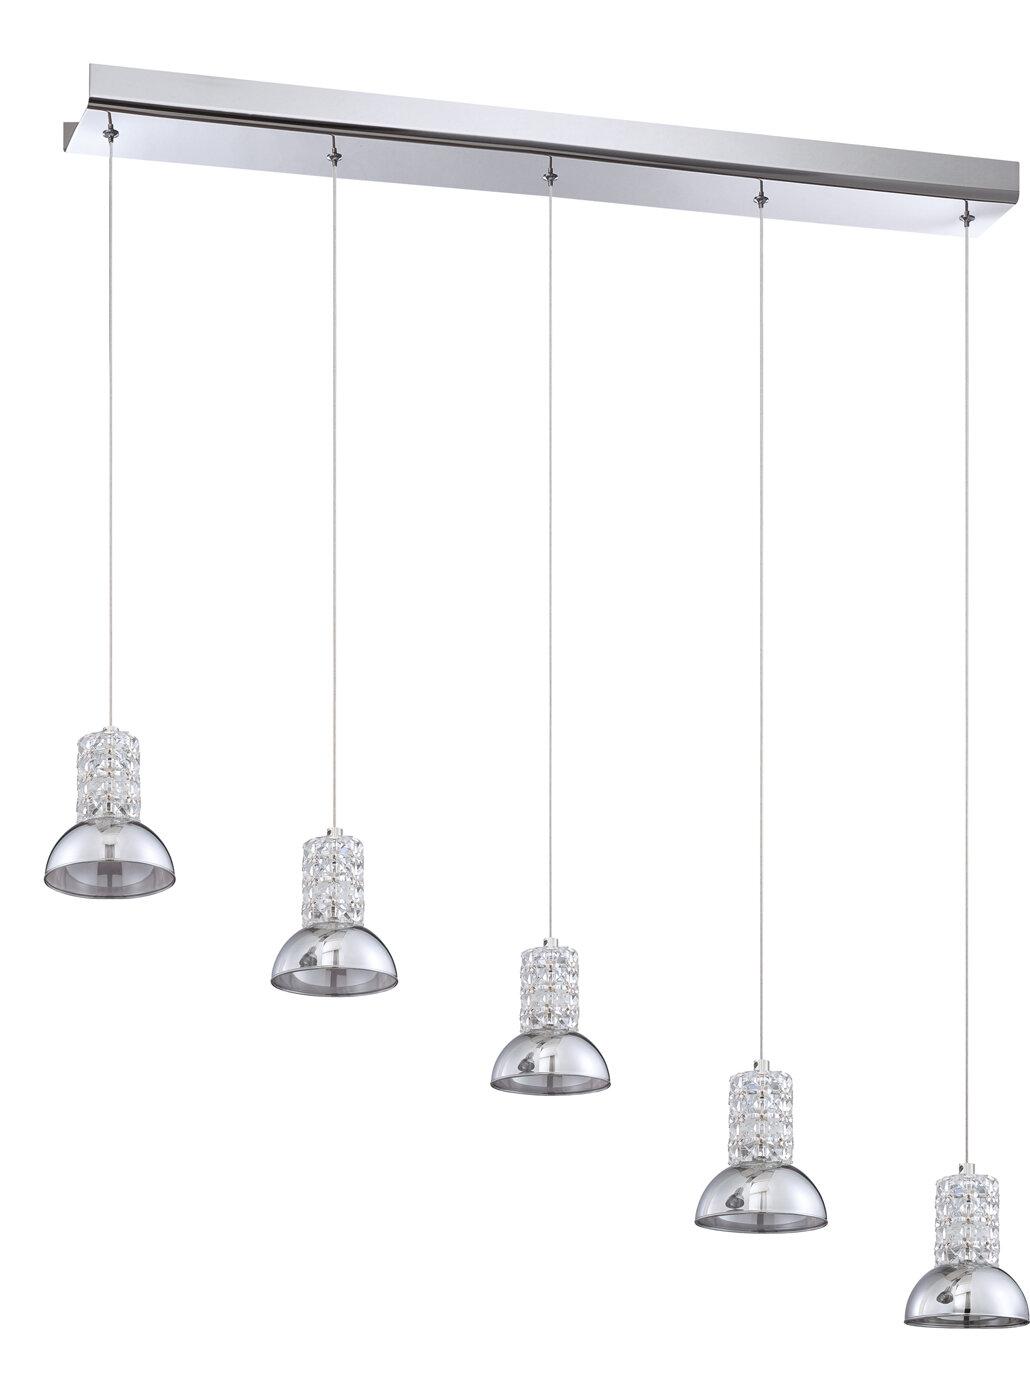 Kendal Lighting Pendant Lighting You Ll Love In 2021 Wayfair